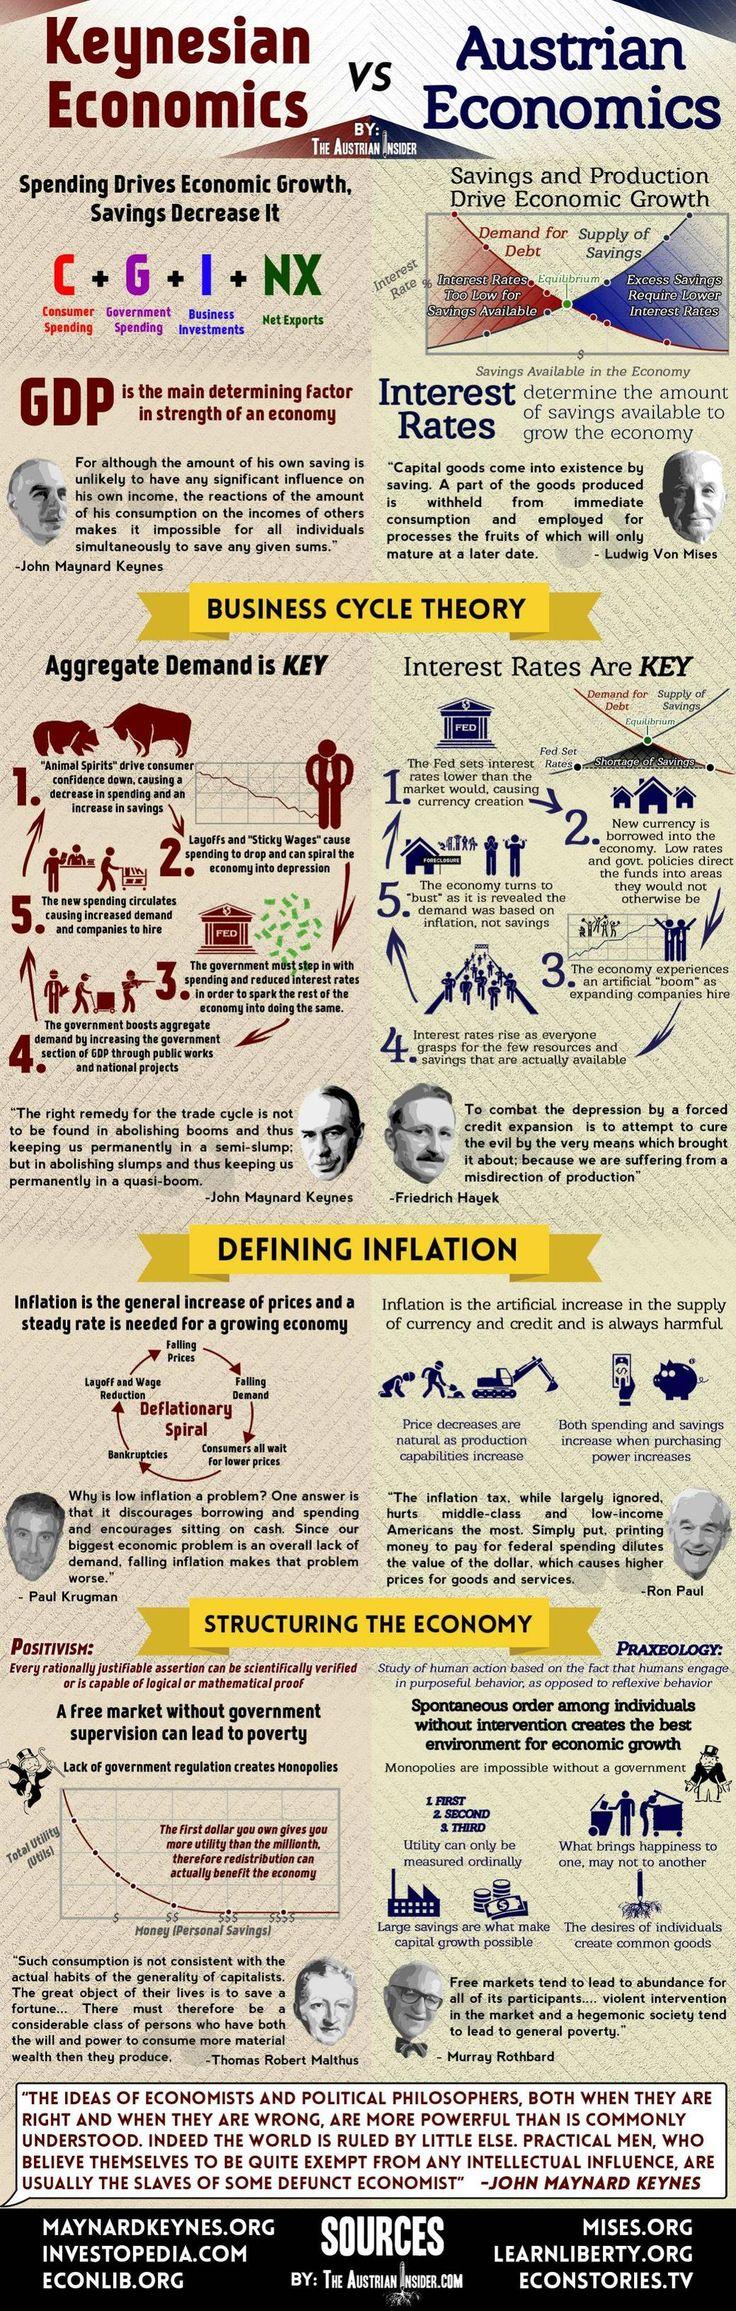 Austrian Economics vs. Keynesian Economics in One Simple Chart